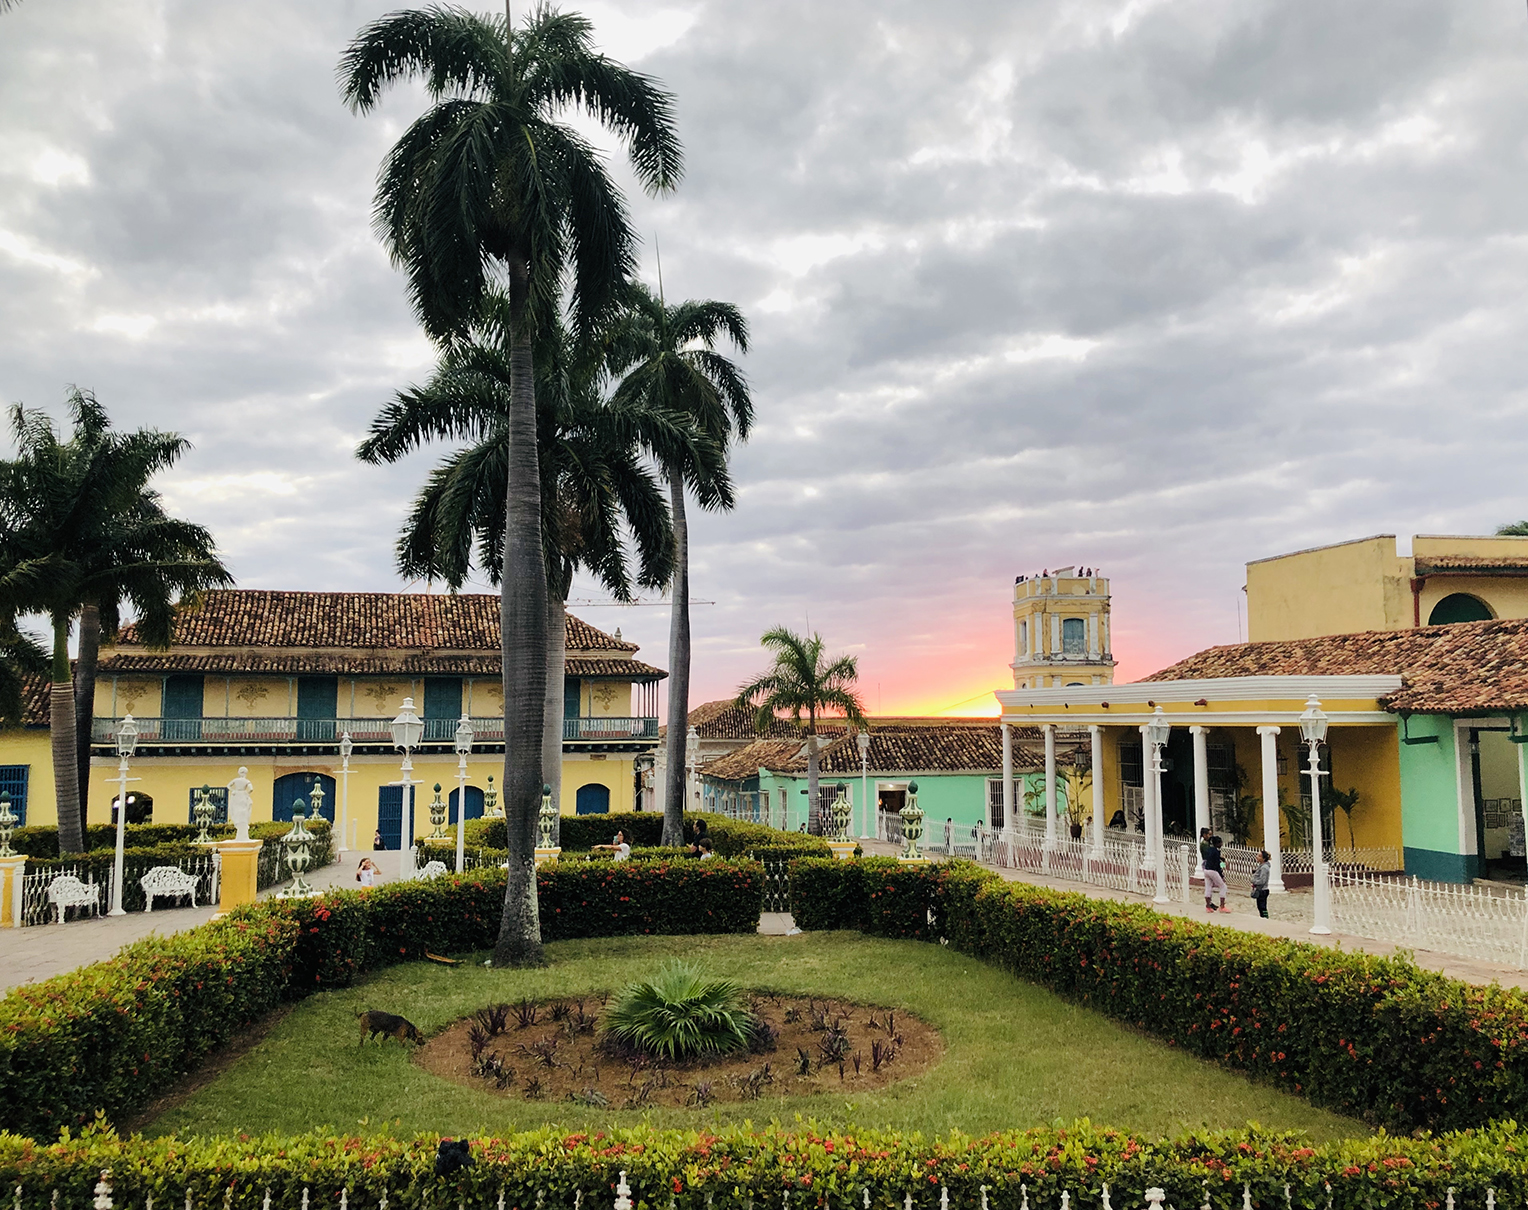 Trinidad Tableau